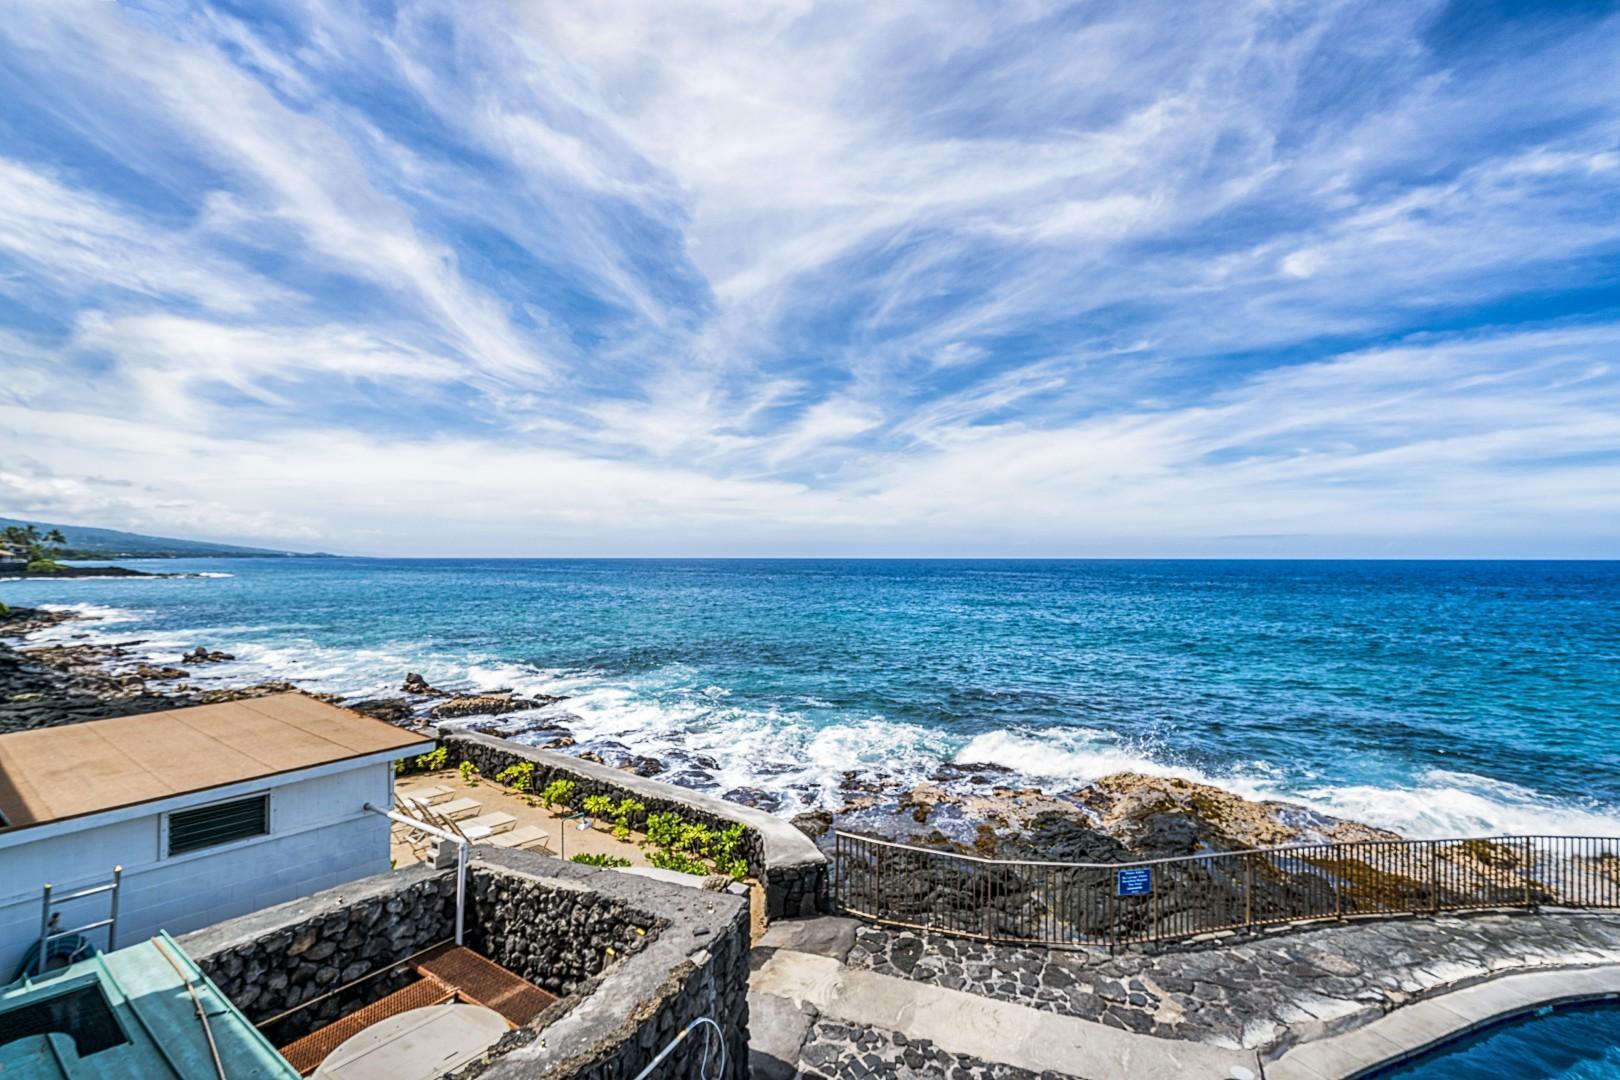 Ocean front complex features miles of coastline views!